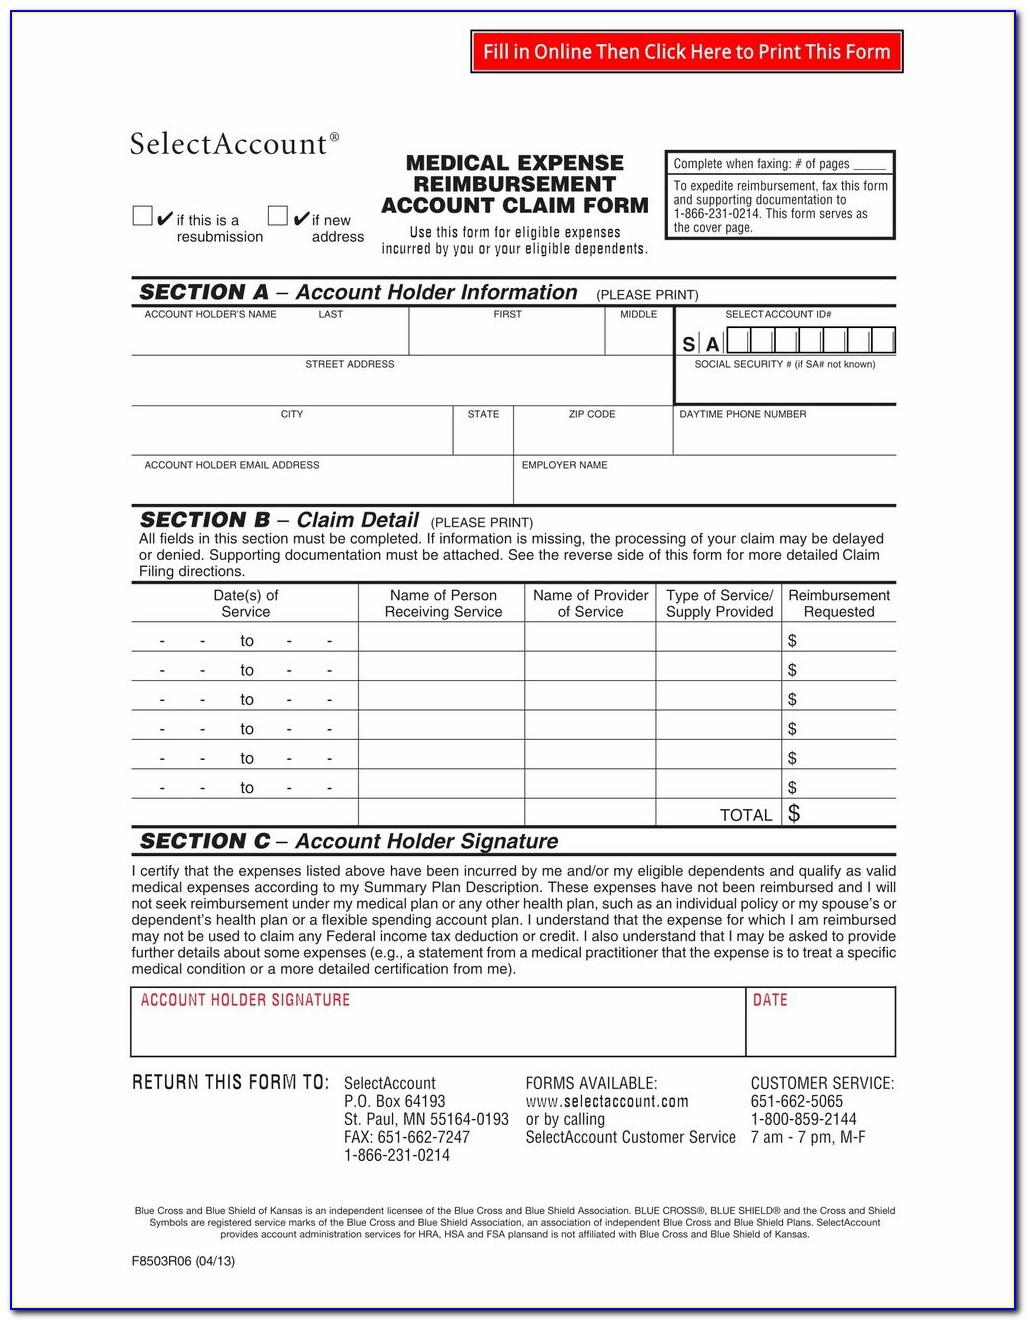 Fmla California Forms 2016